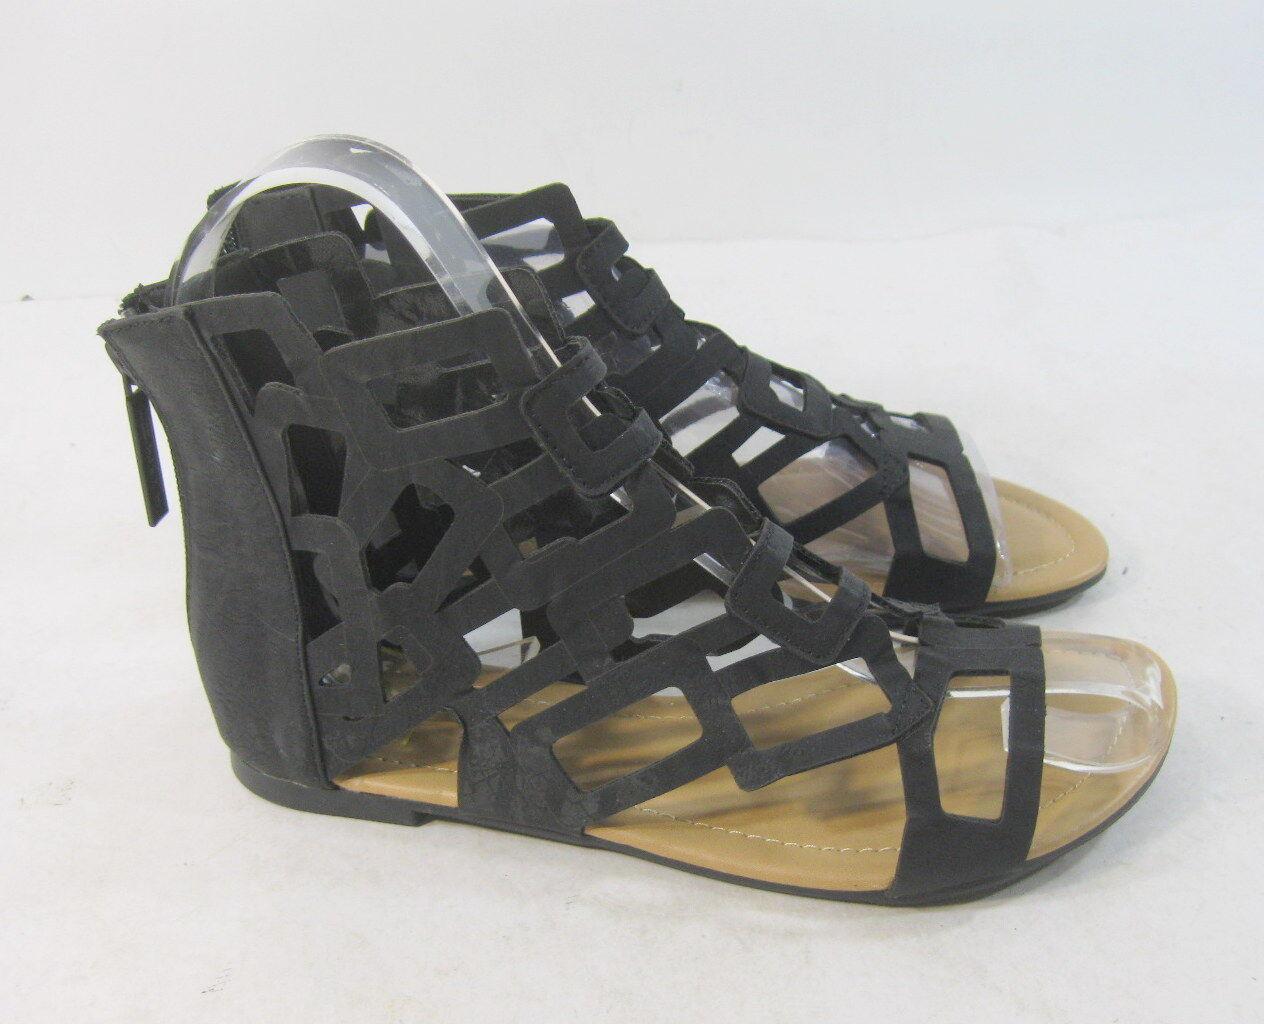 new Womens Toe Summer Black Womens Open Toe Womens Flat Sexy Cool Sandal Size 7.5 f252f1